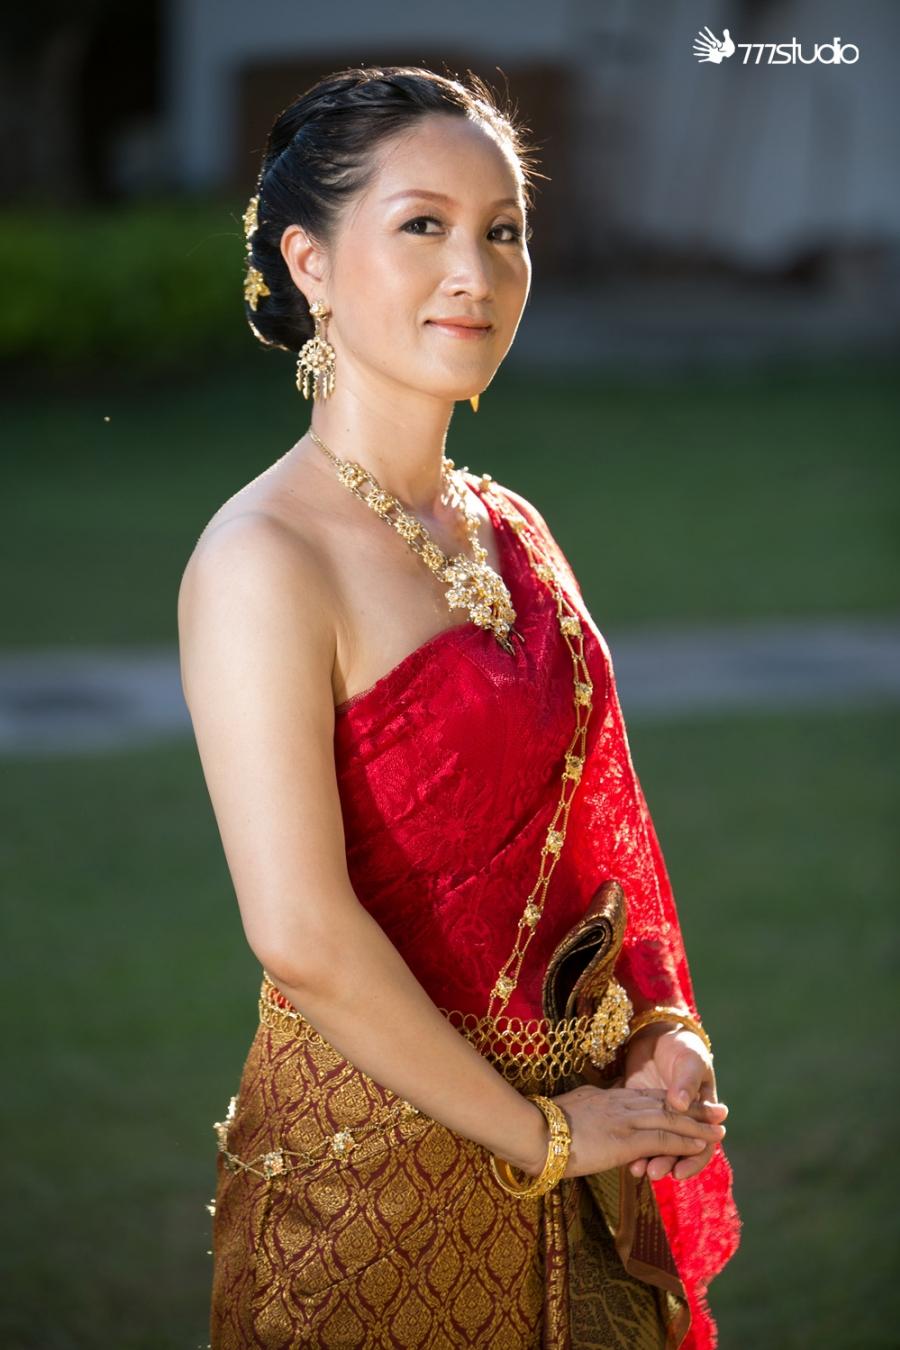 Dating introduction Thai bride 11 april 19 you